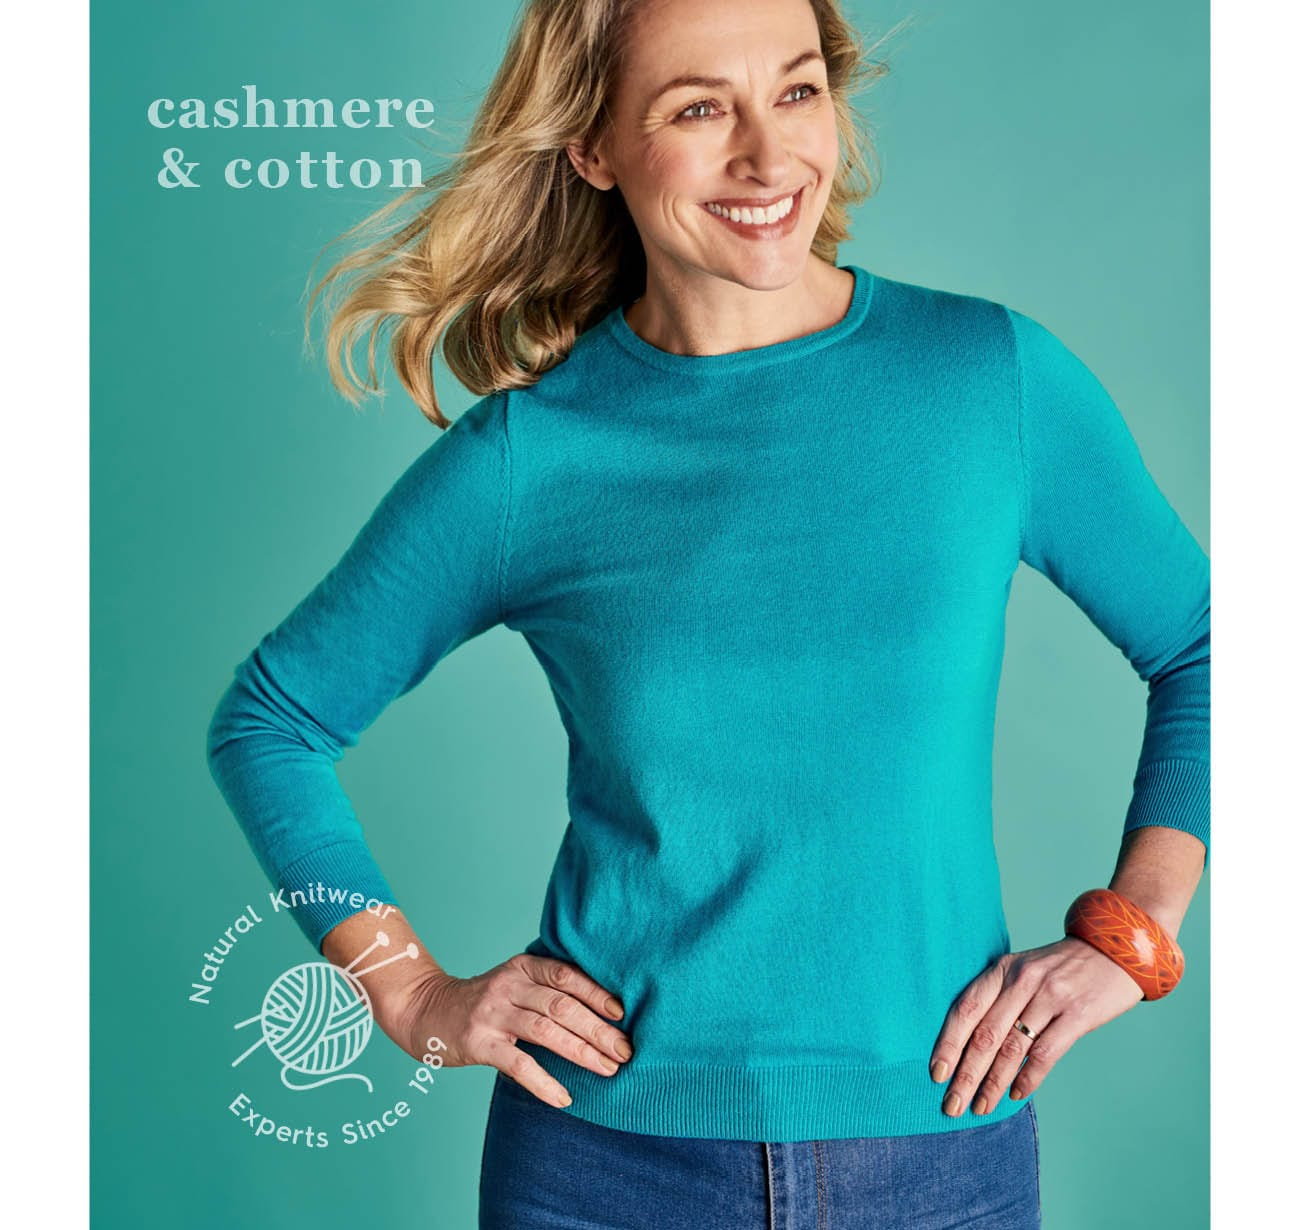 Womens Cashmere & Cotton Knitwear